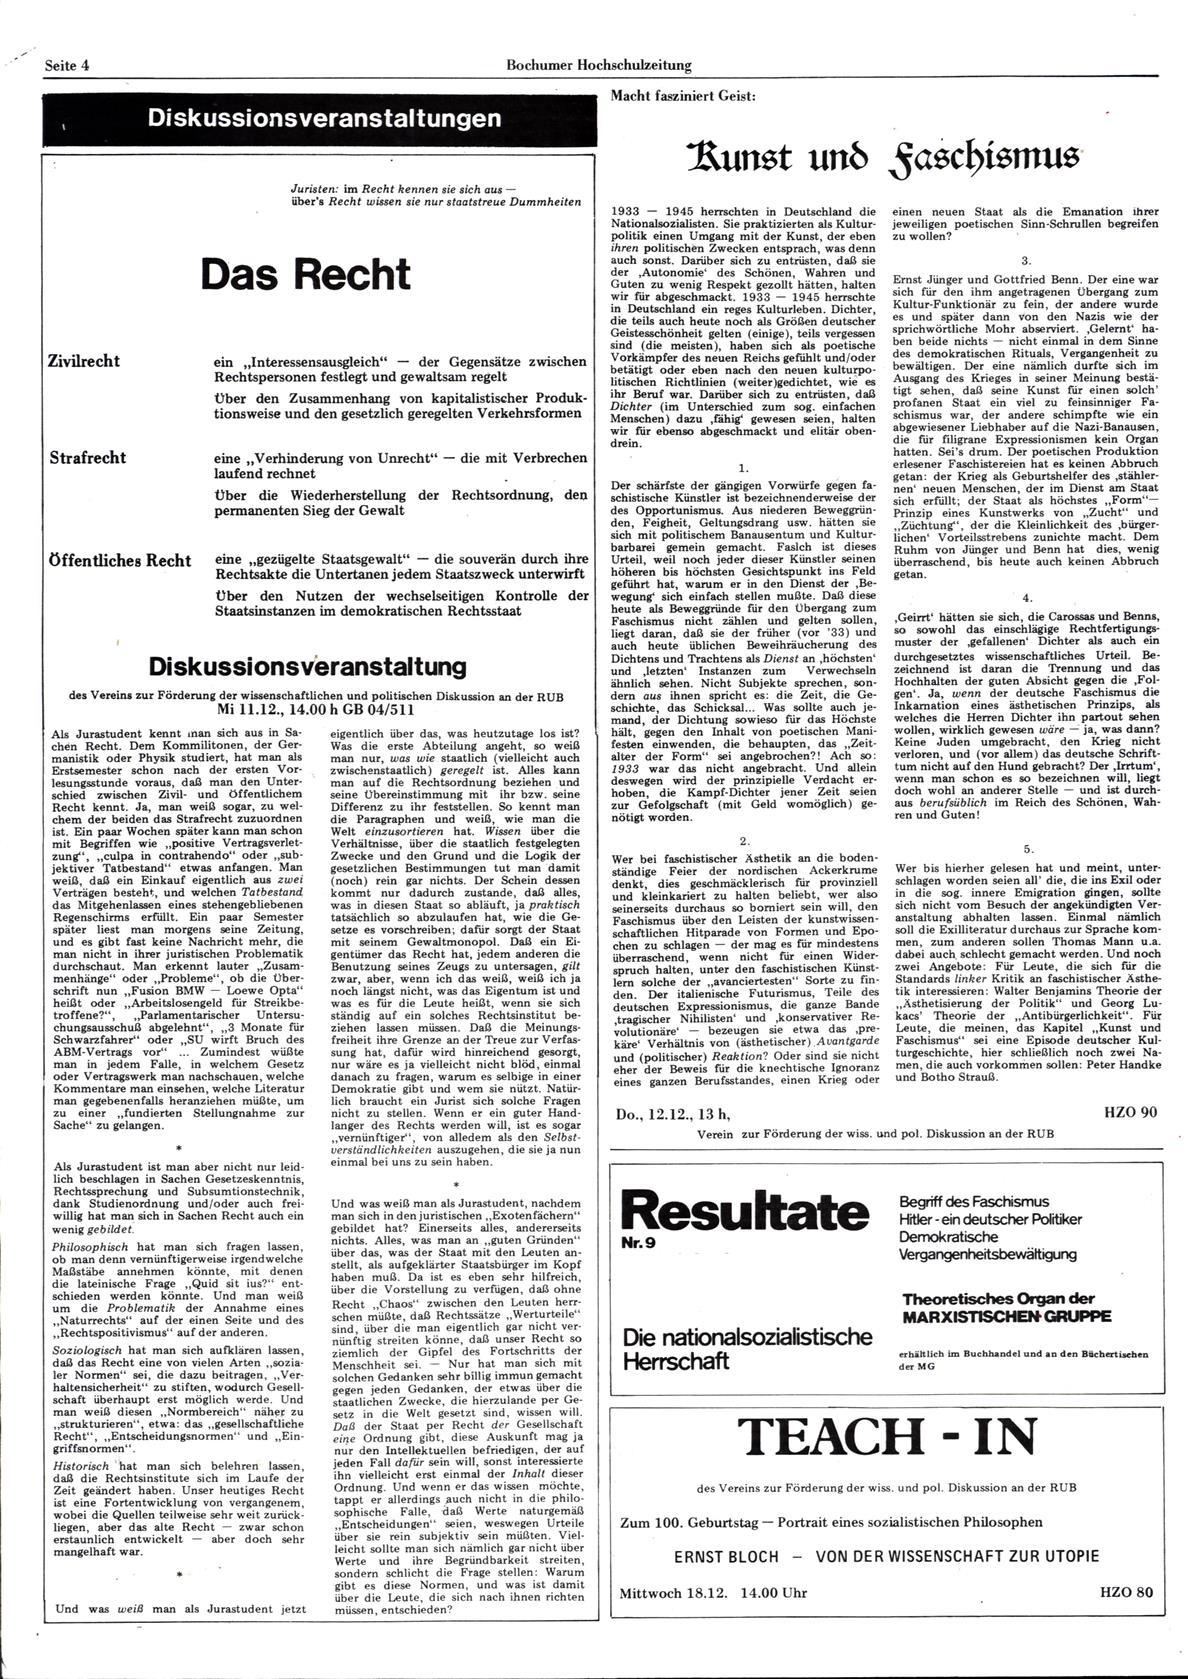 Bochum_BHZ_19851210_121_004